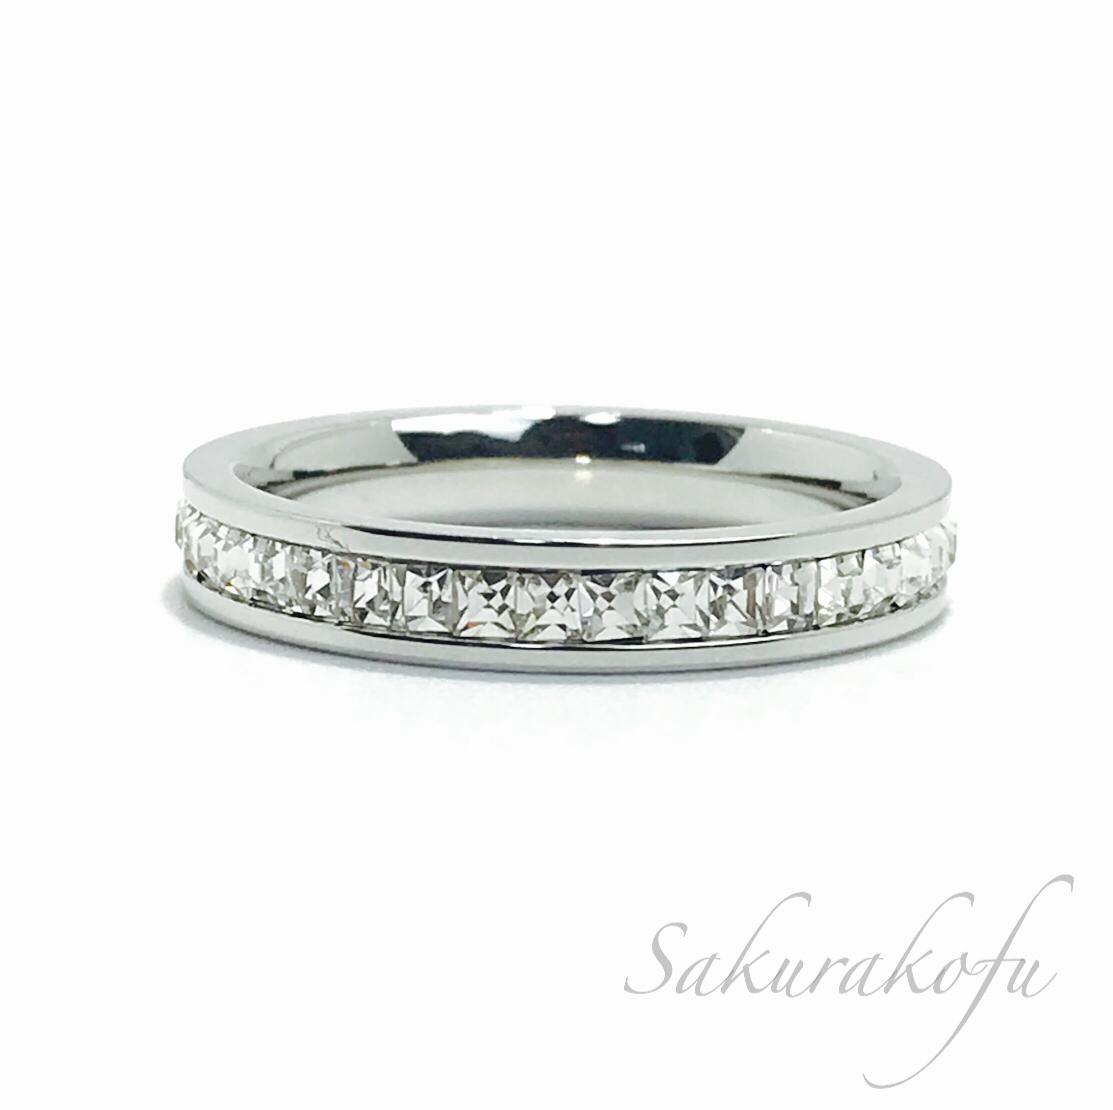 D003 送料無料 レディース 指輪 アクセサリー Silver Eternity Ring